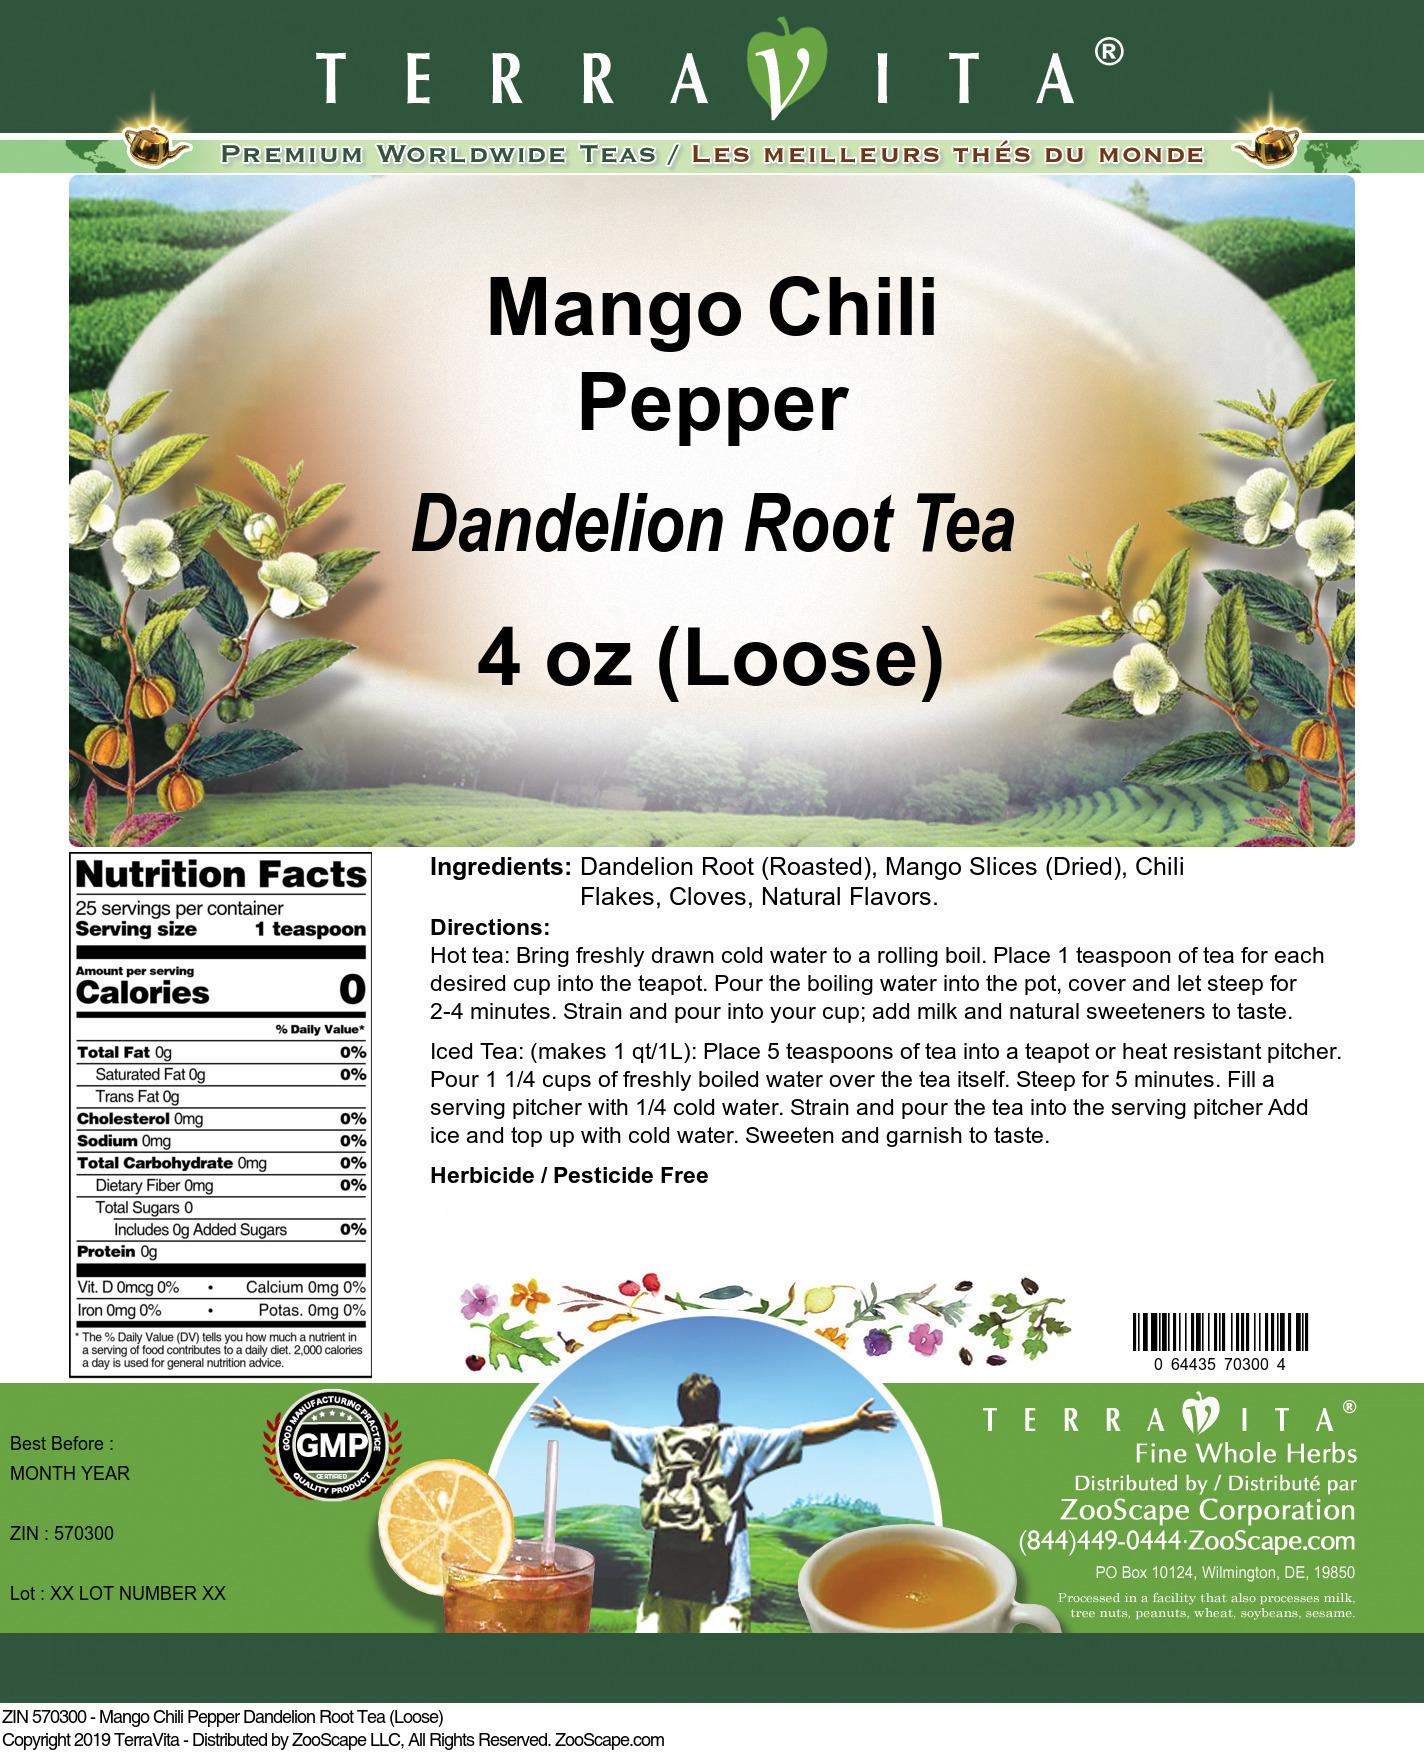 Mango Chili Pepper Dandelion Root Tea (Loose)